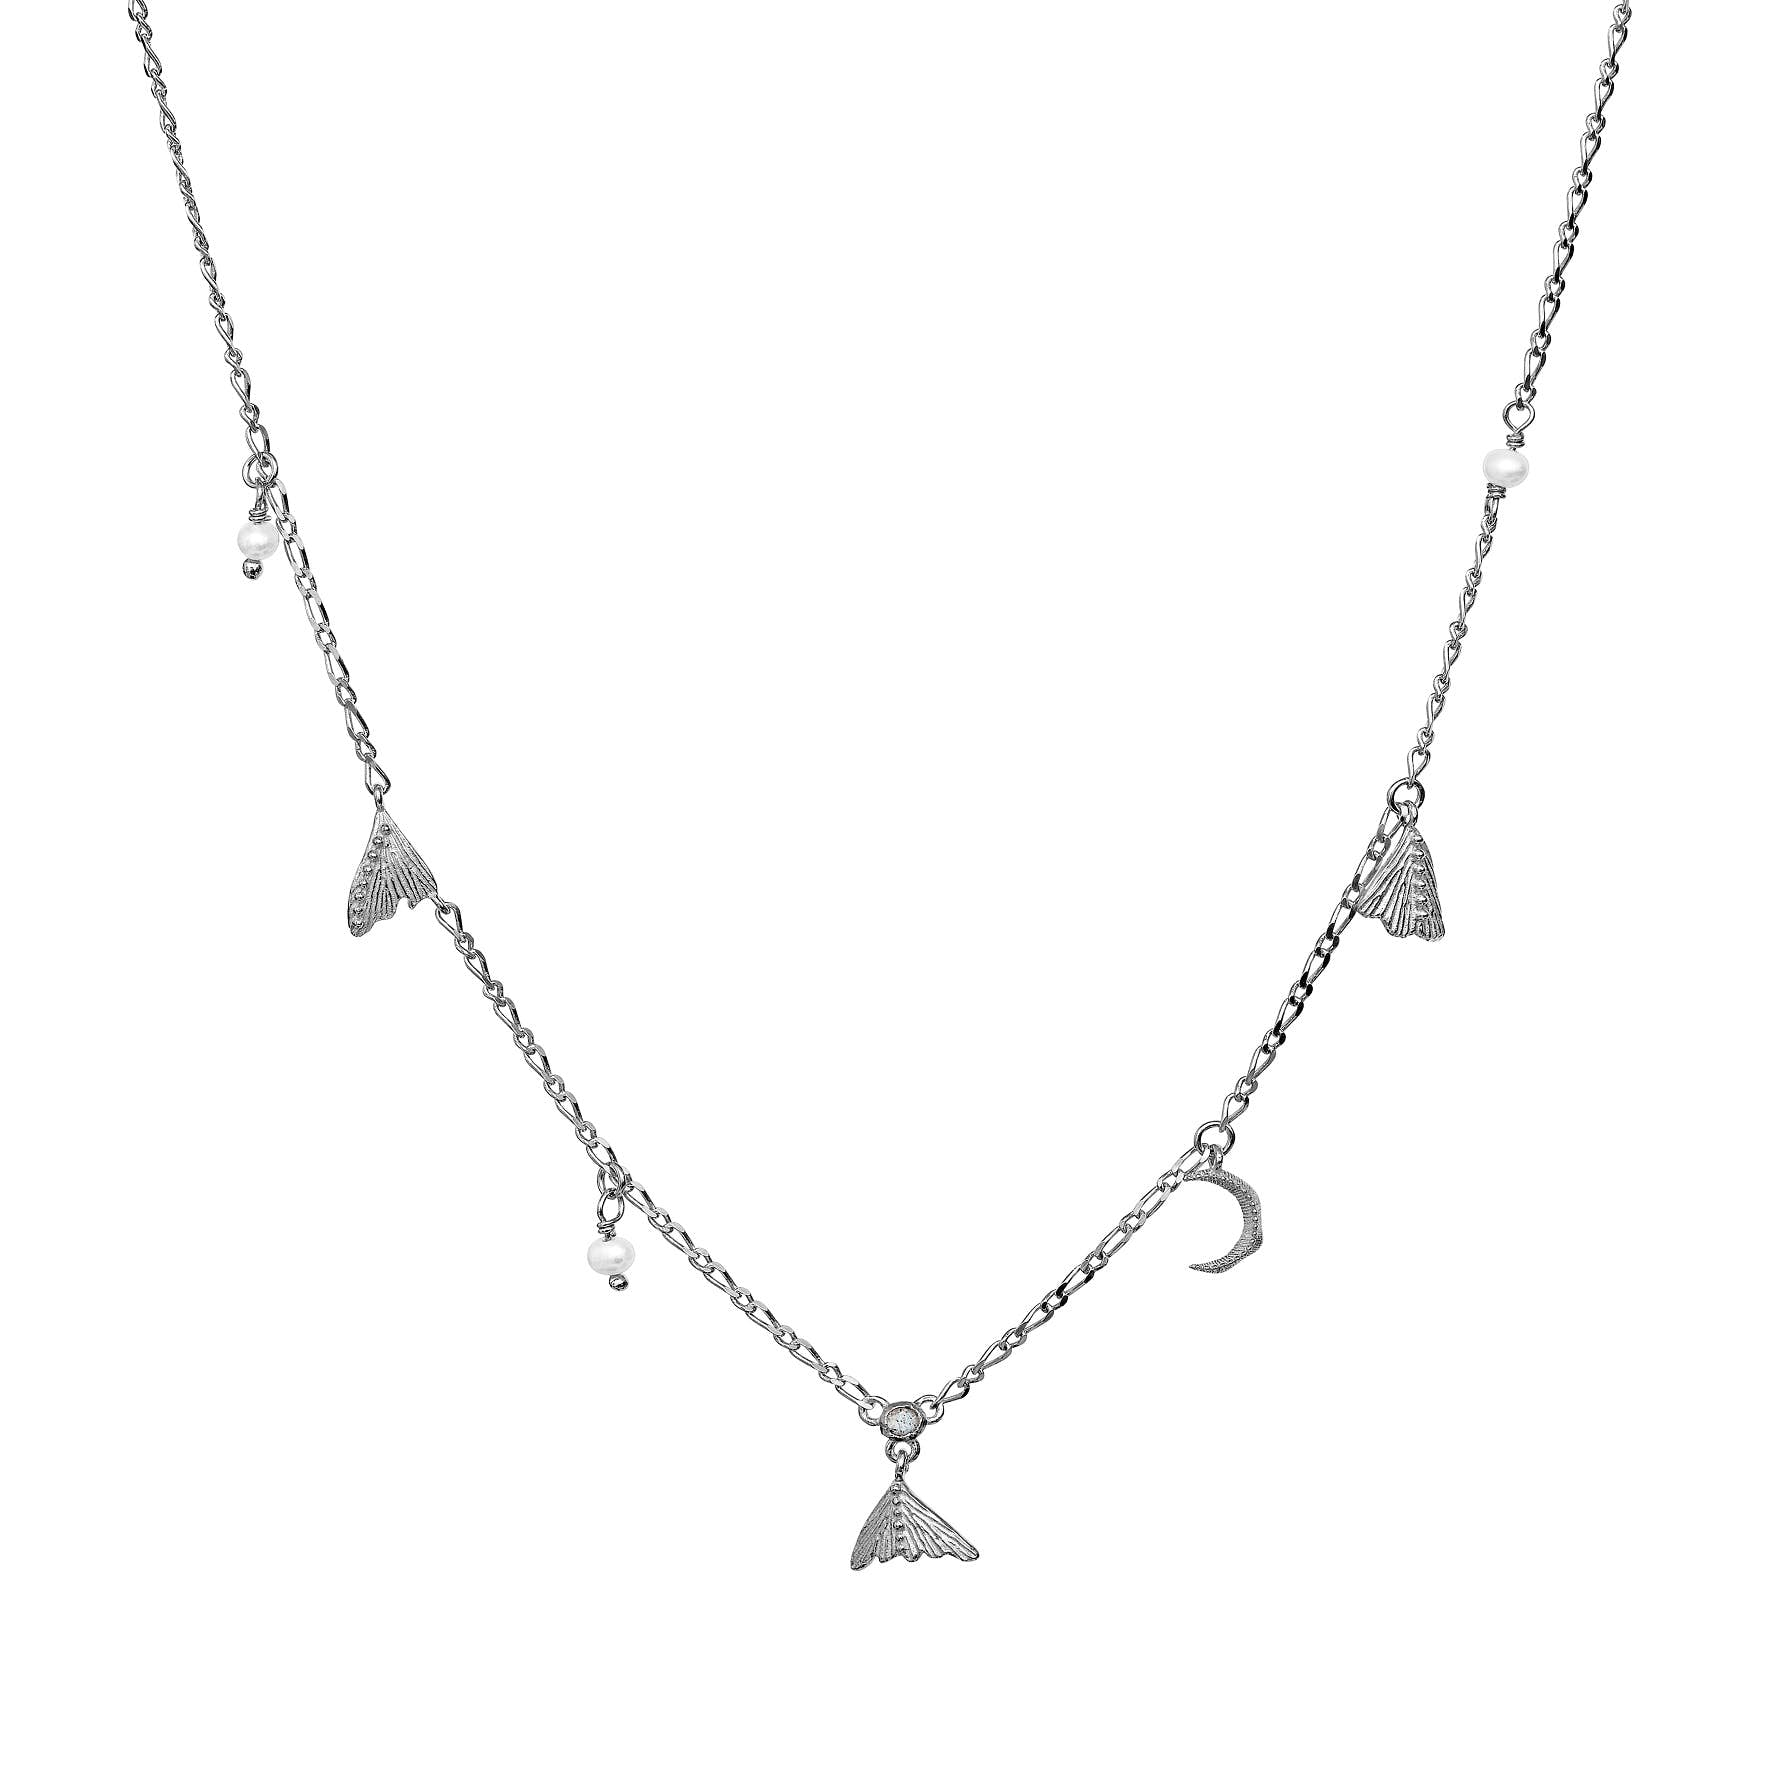 Nocha Necklace fra Maanesten i Sølv Sterling 925